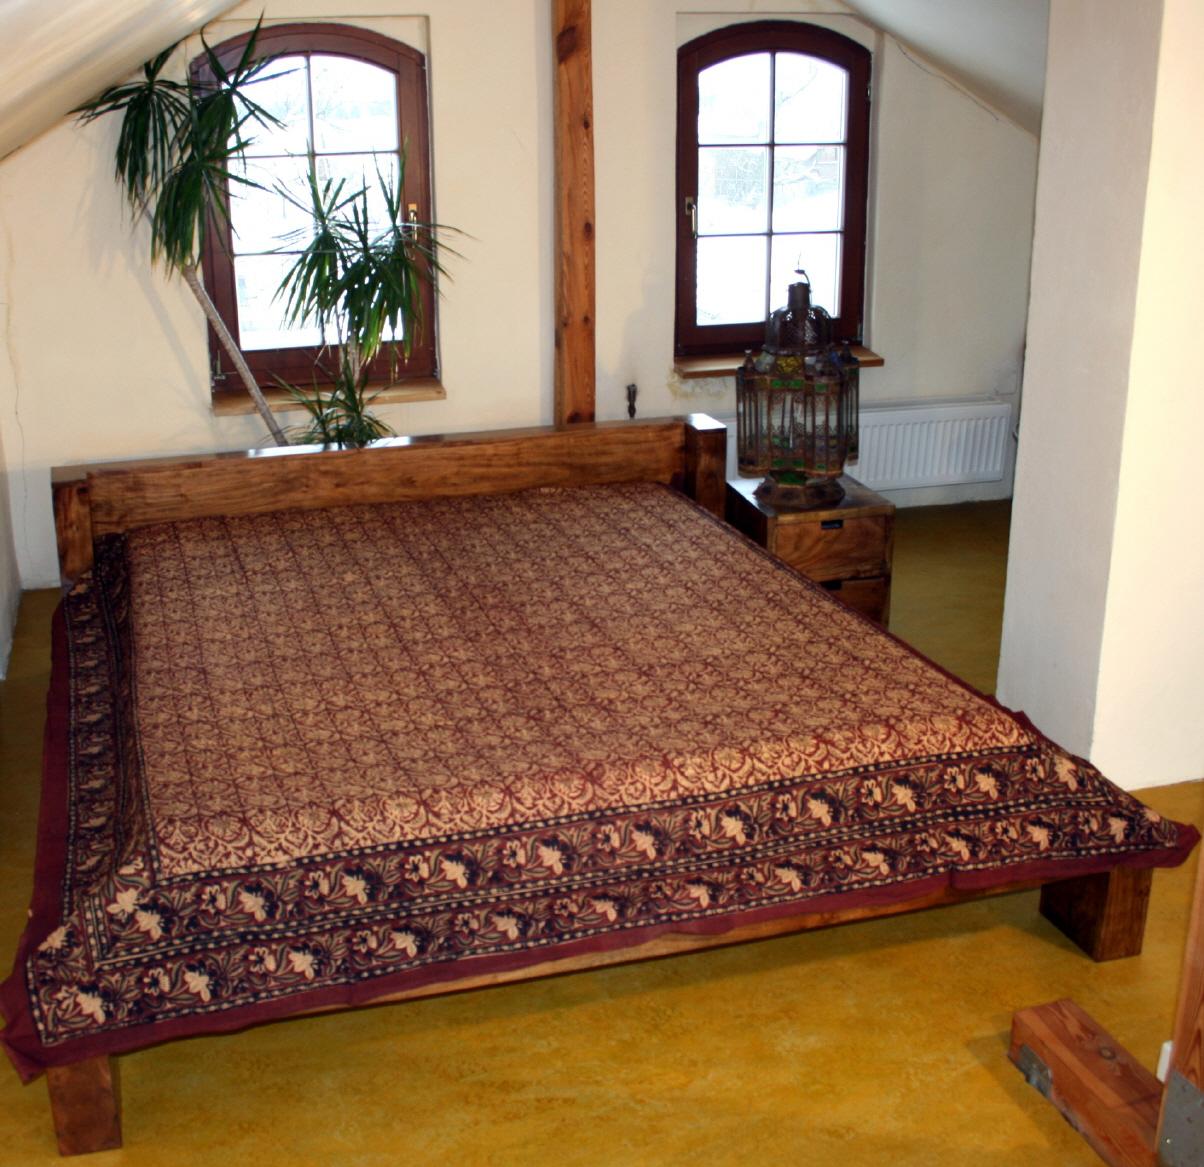 blockdruck tagesdecke bett sofa berwurf. Black Bedroom Furniture Sets. Home Design Ideas